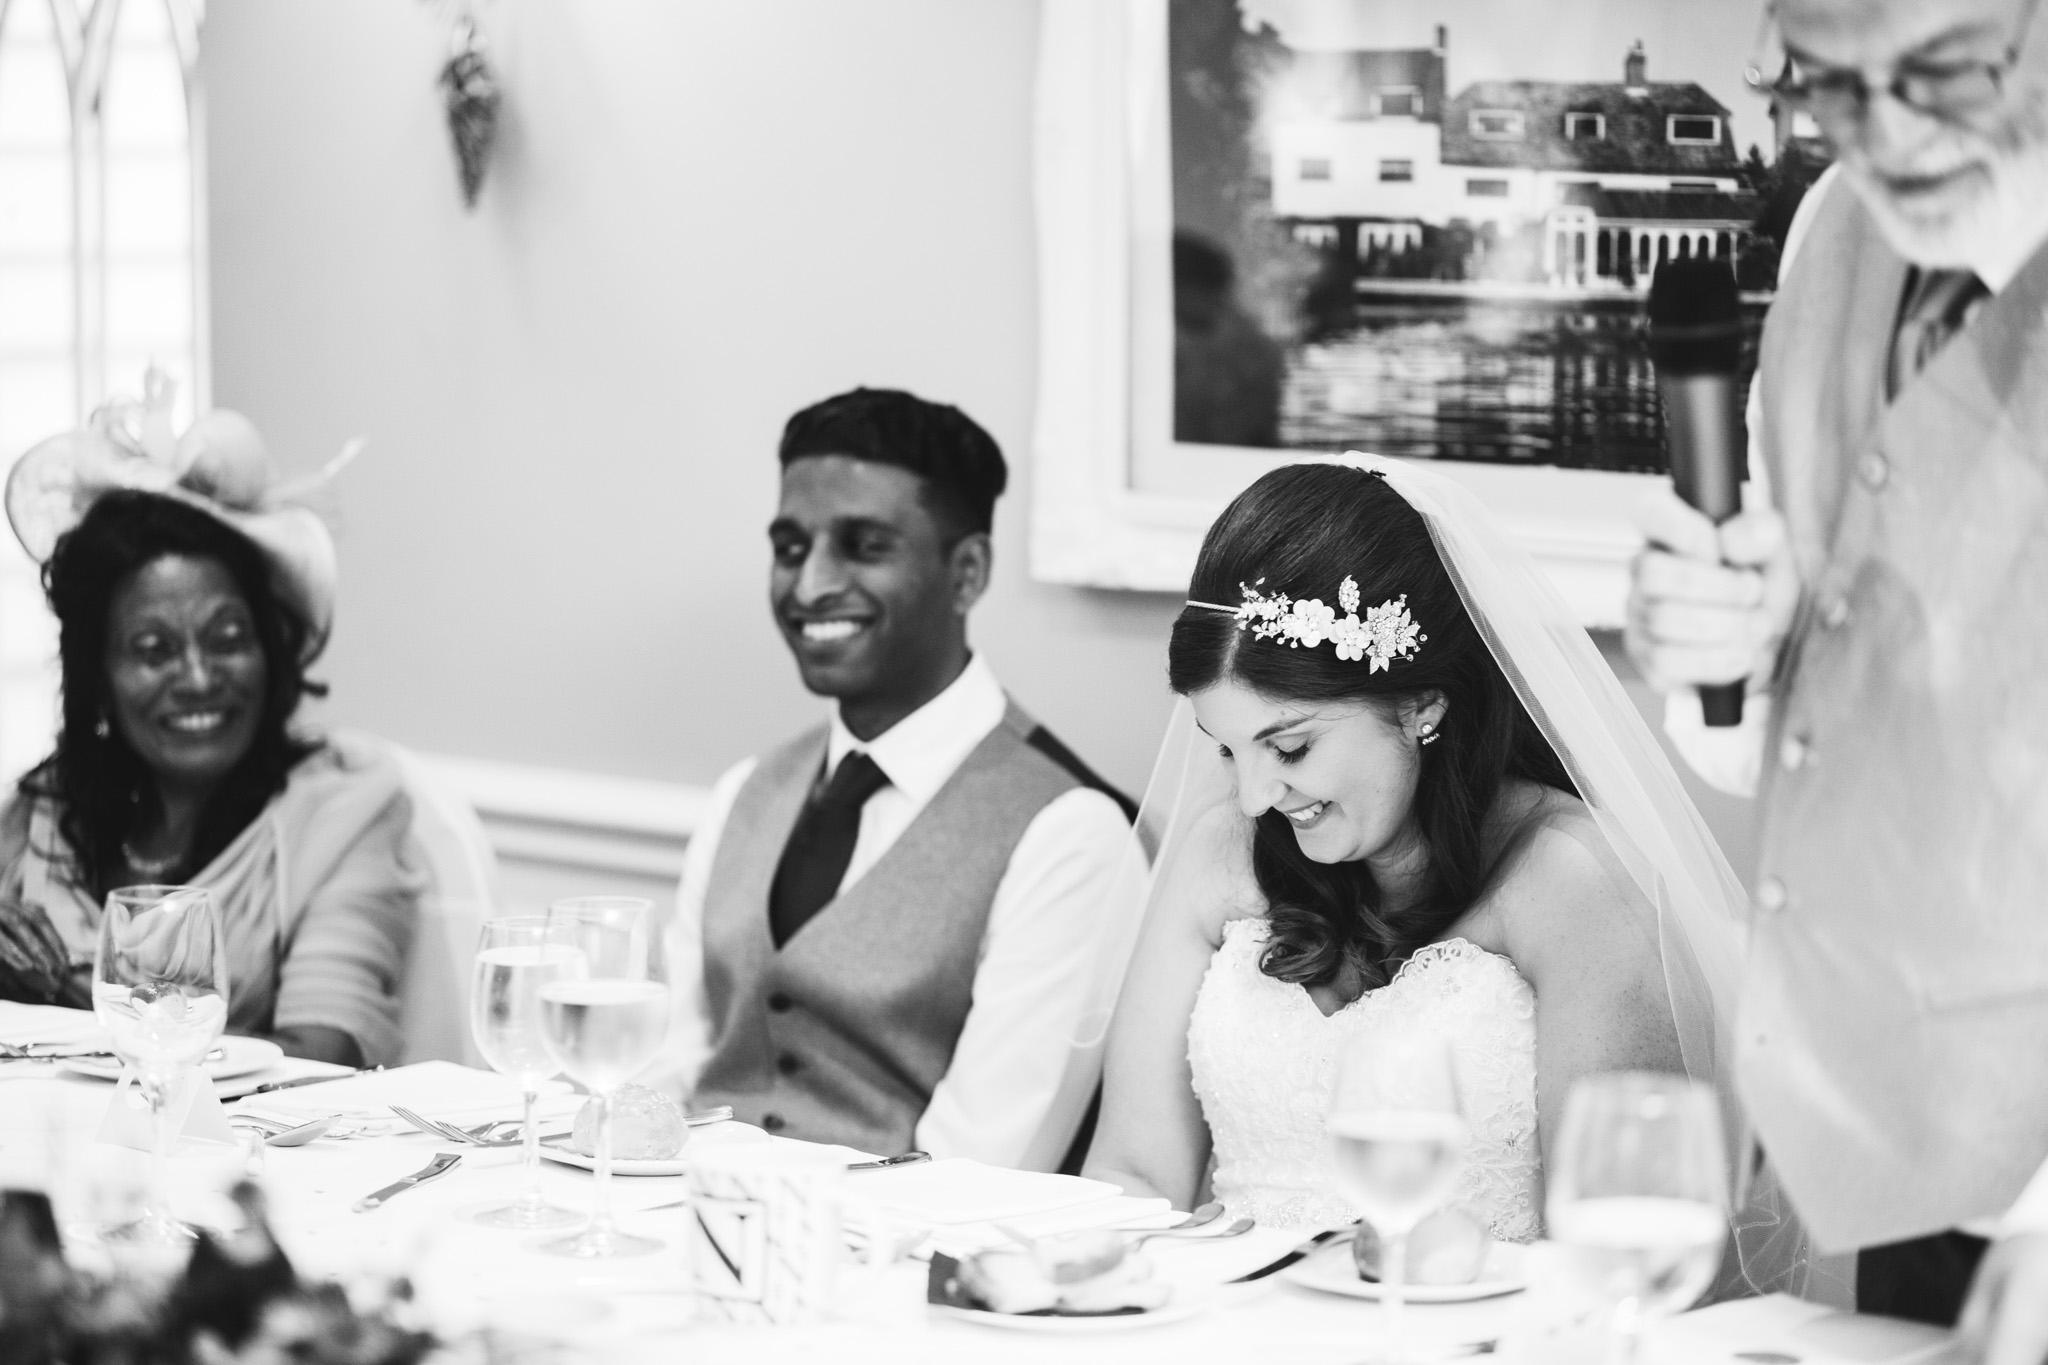 cat-lane-weddings__sheene-mill-wedding-photography__clw__1654__C5A9813.jpg